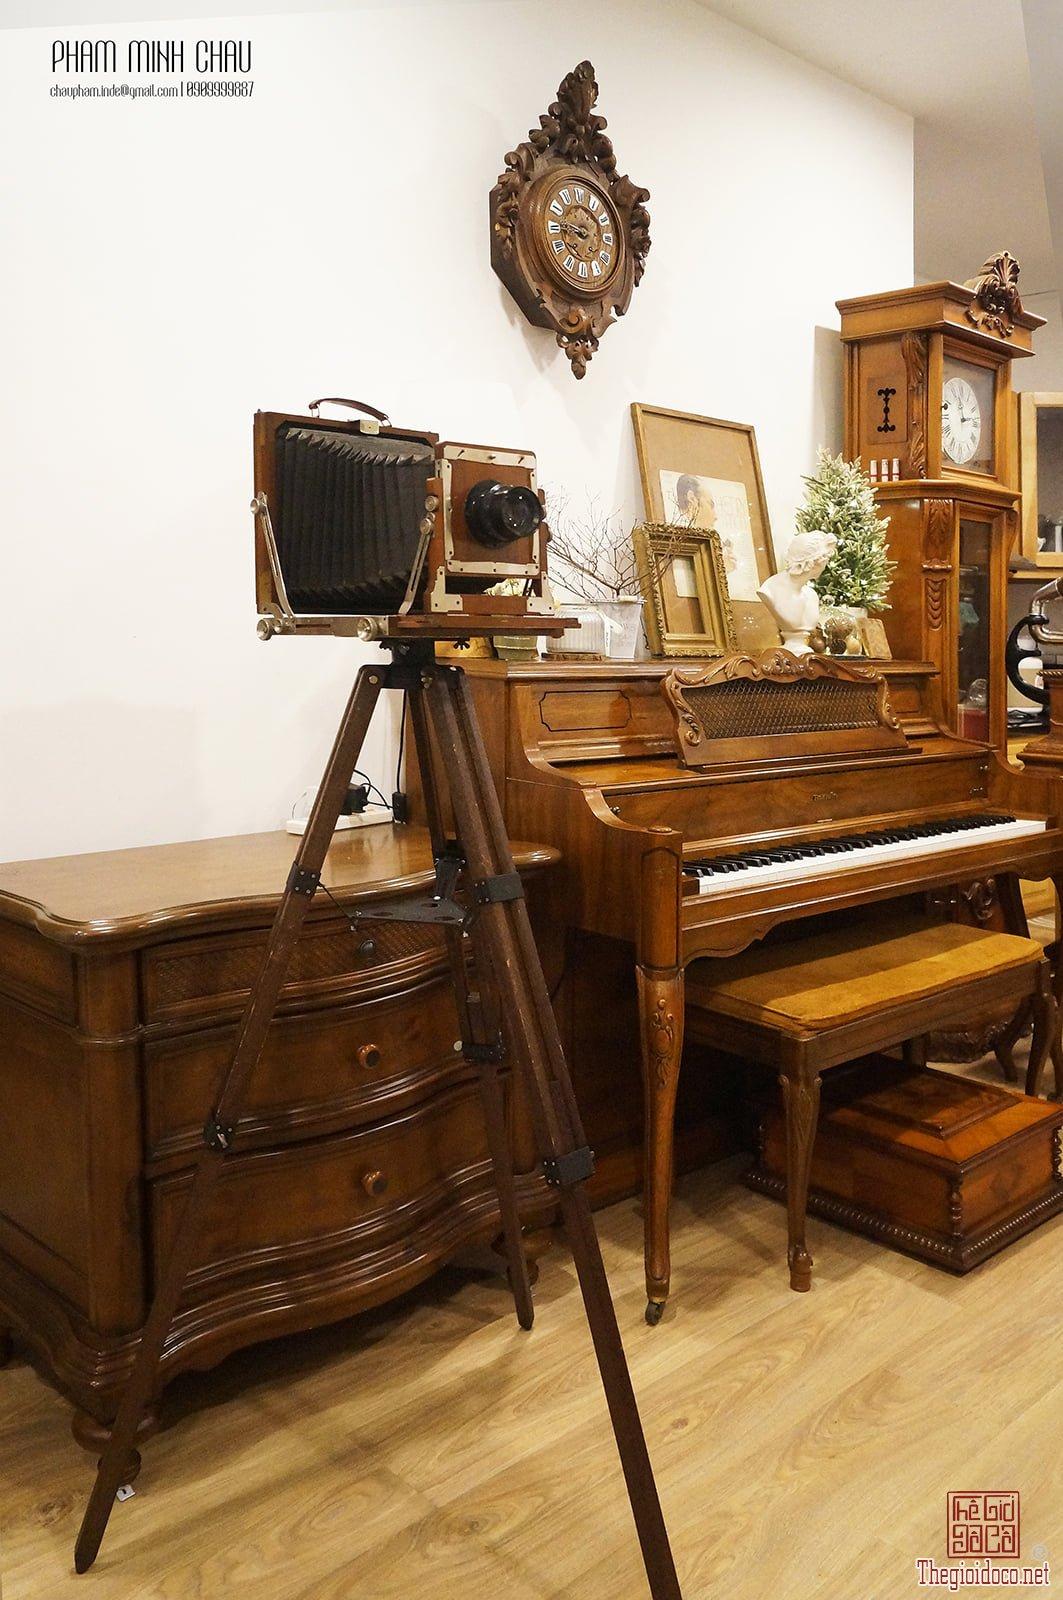 Máy ảnh gỗ cổ điển Asanuma King Field Camera